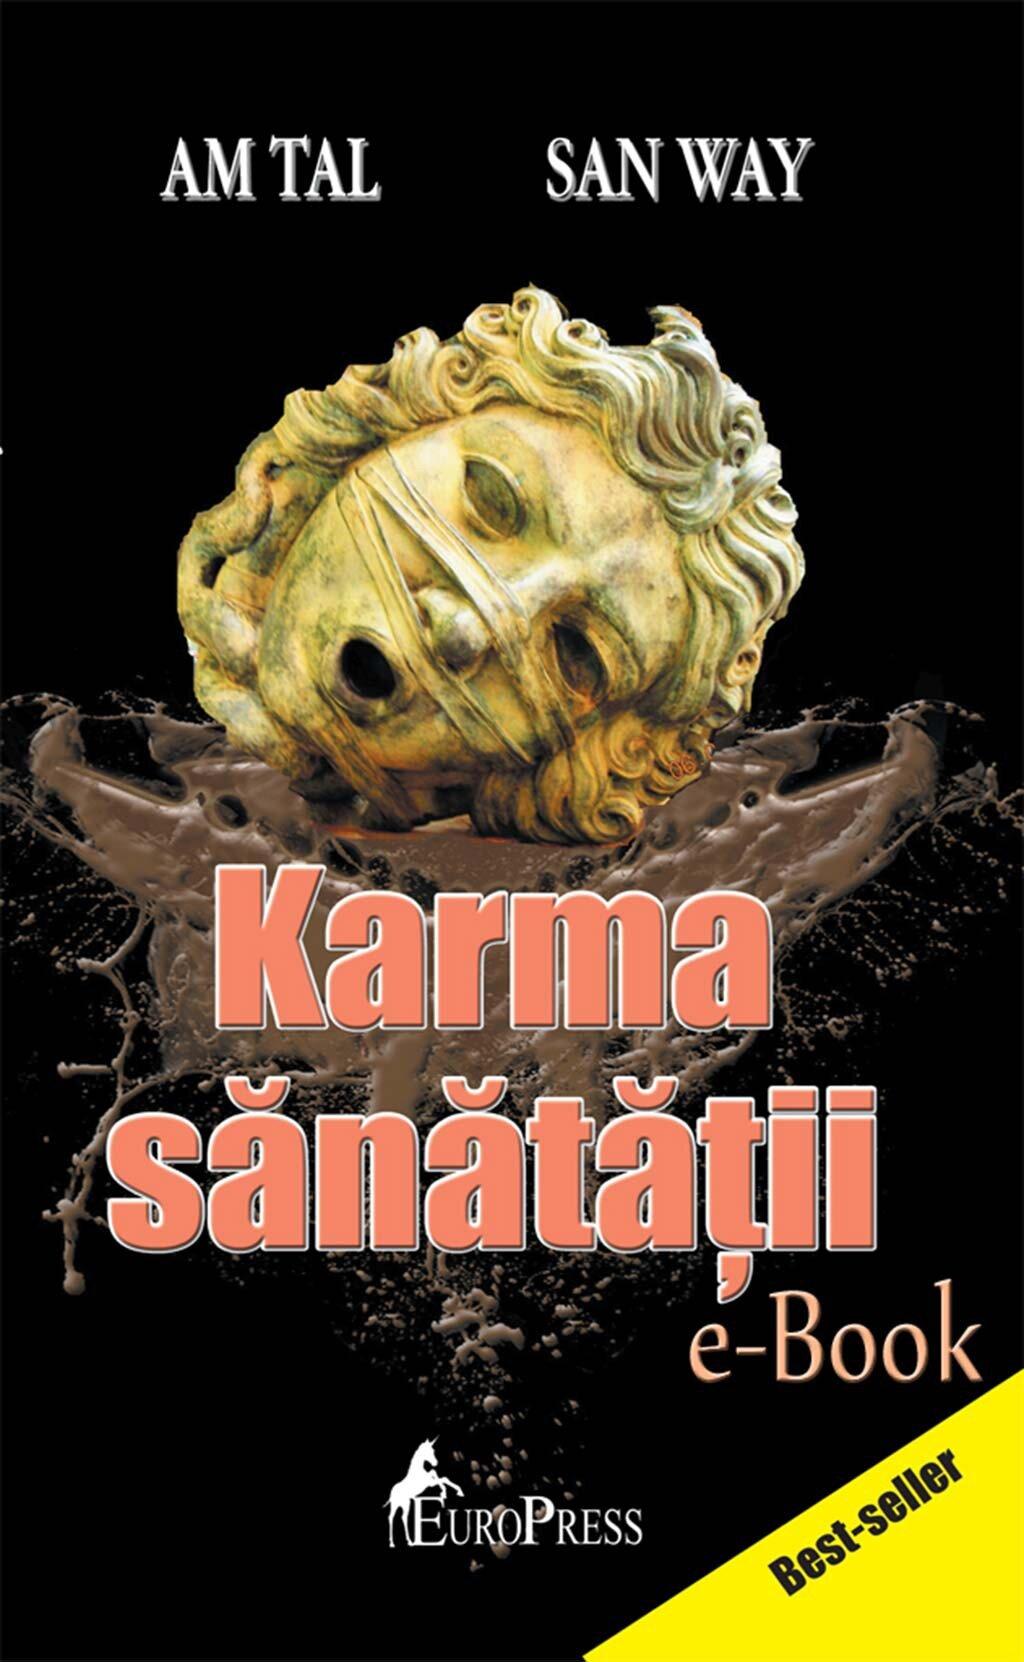 Karma sanatatii (eBook)